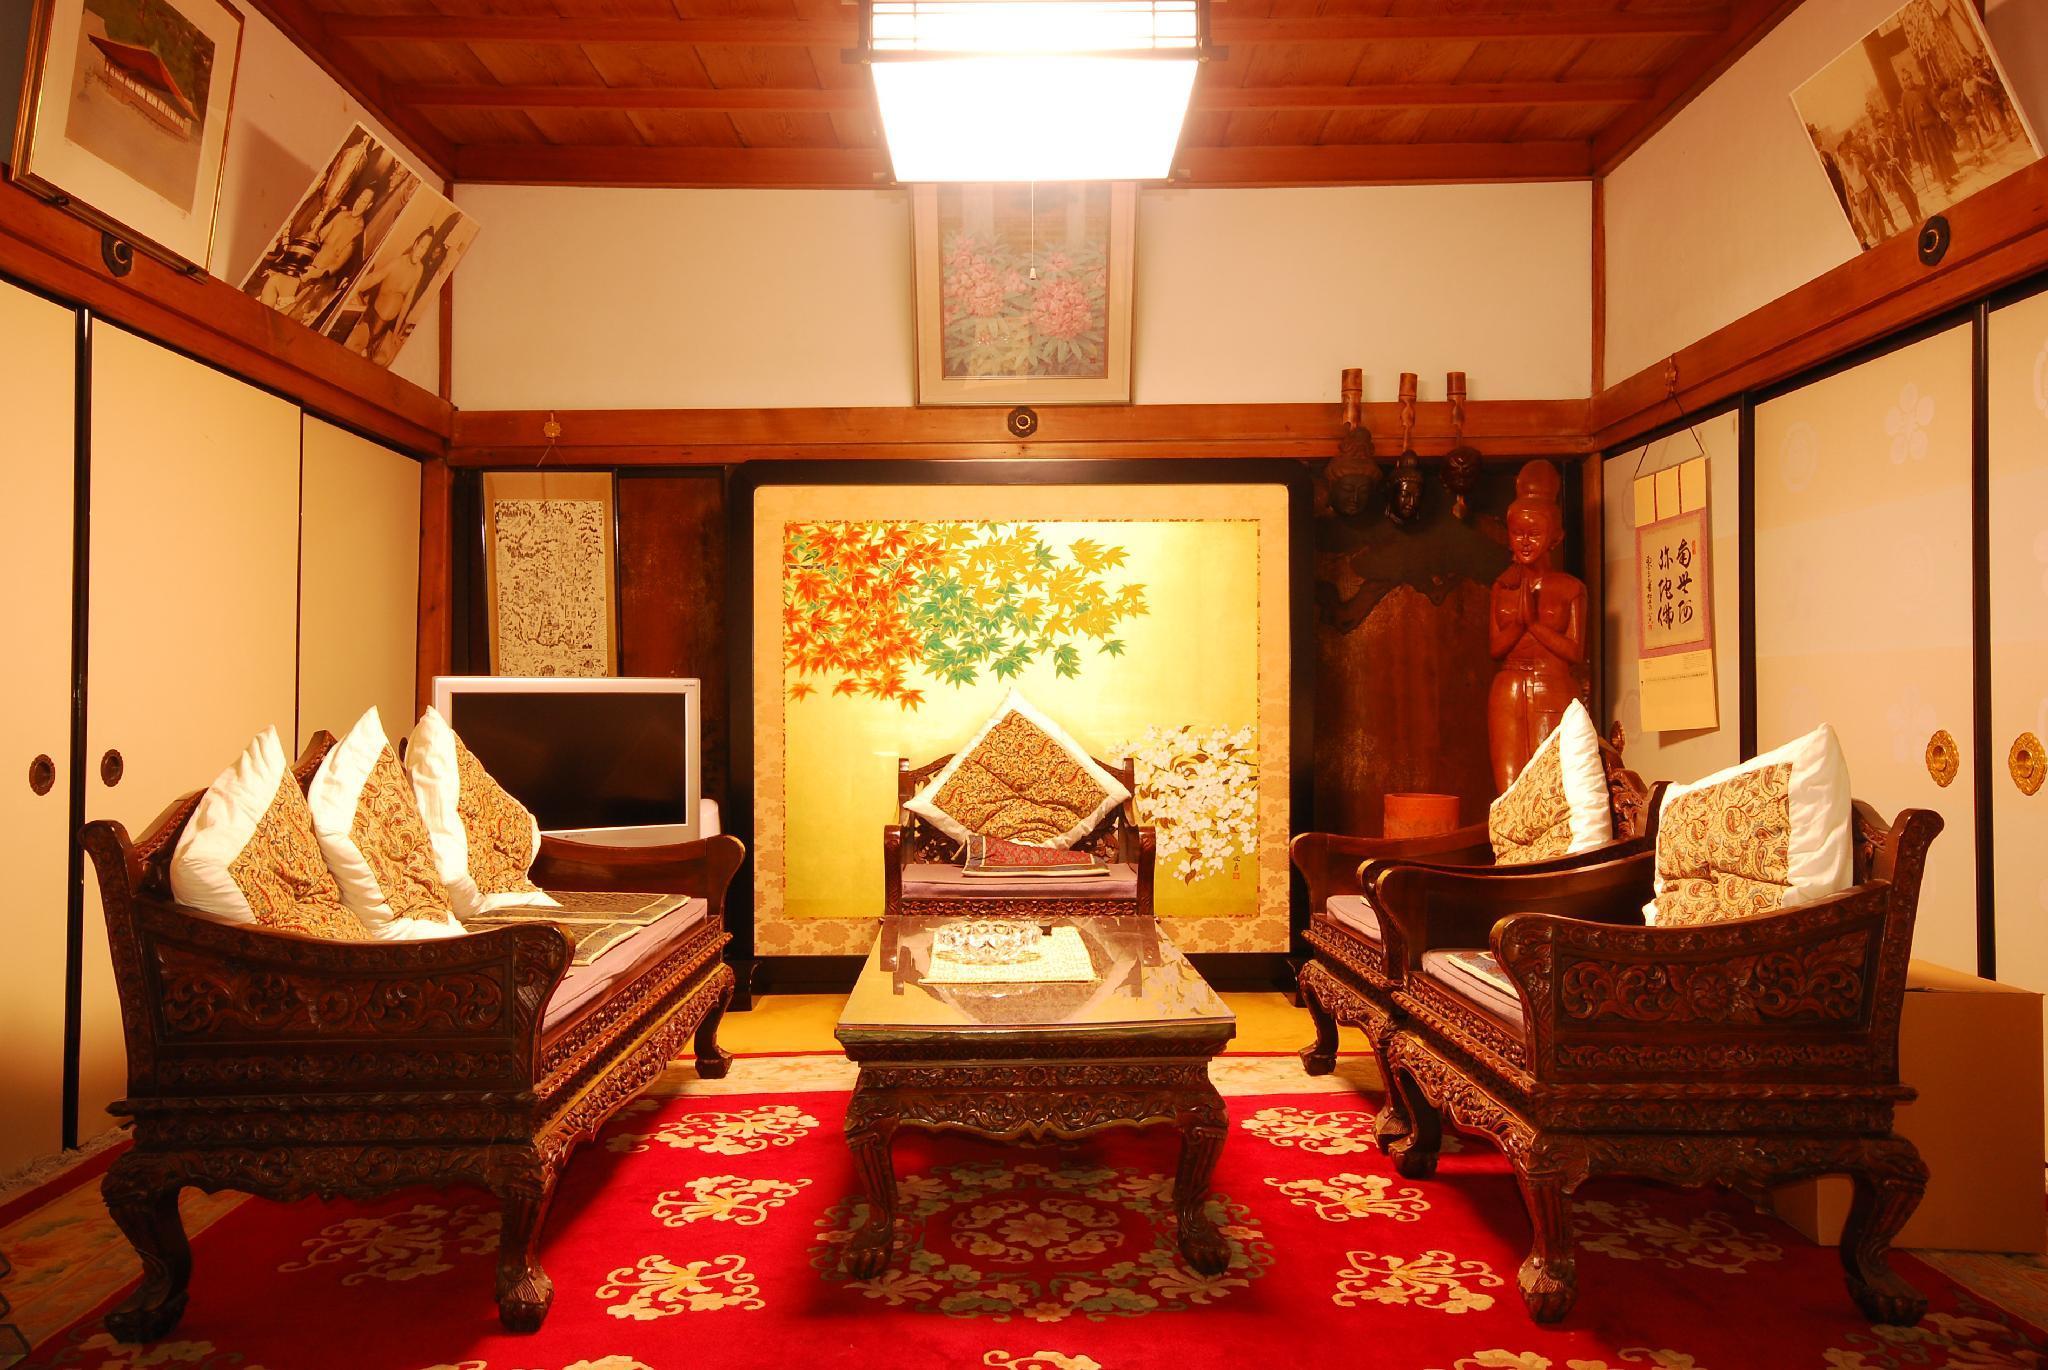 Koyasan Shukobo Zofukuin, Kōya